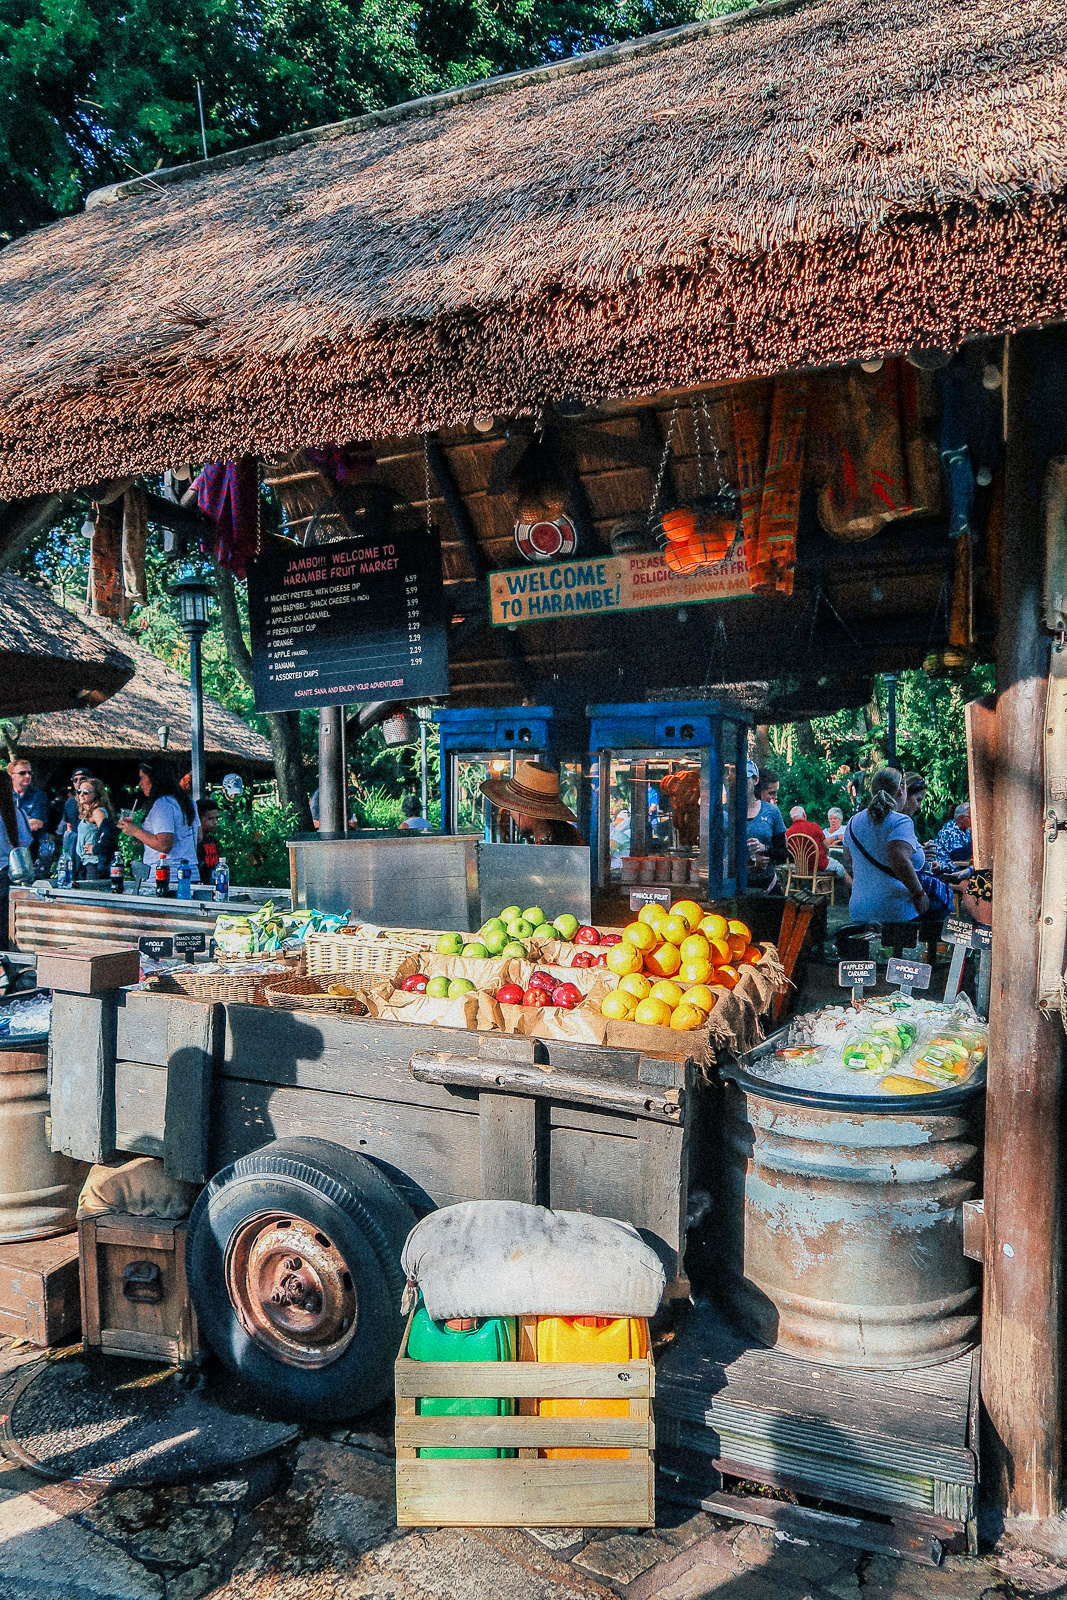 https://disneyworld.disney.go.com/dining/animal-kingdom/harambe-fruit-market/